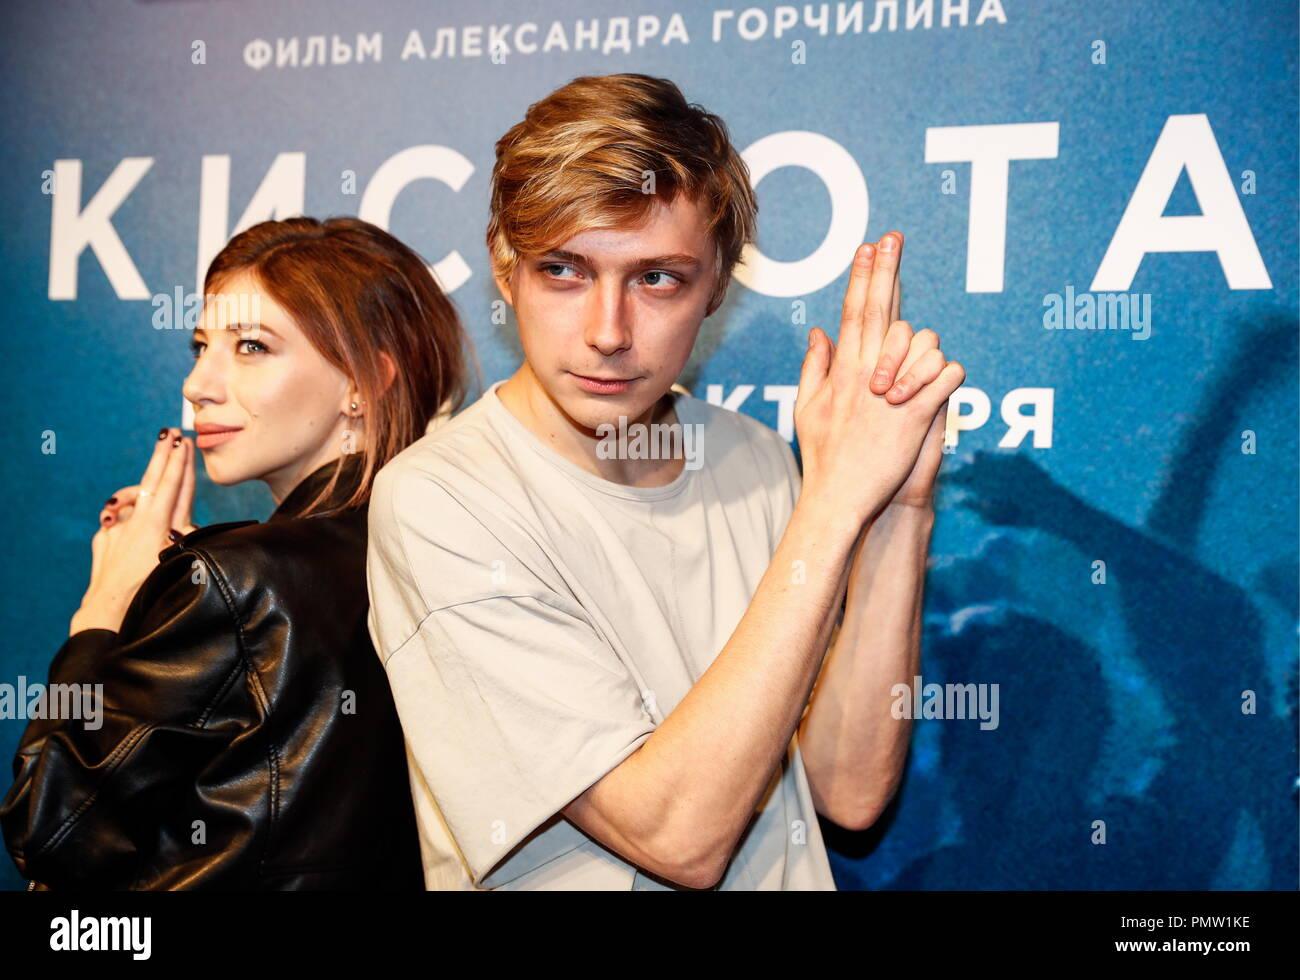 Anastasia Sergeyeva gogol centre stock photos & gogol centre stock images - alamy